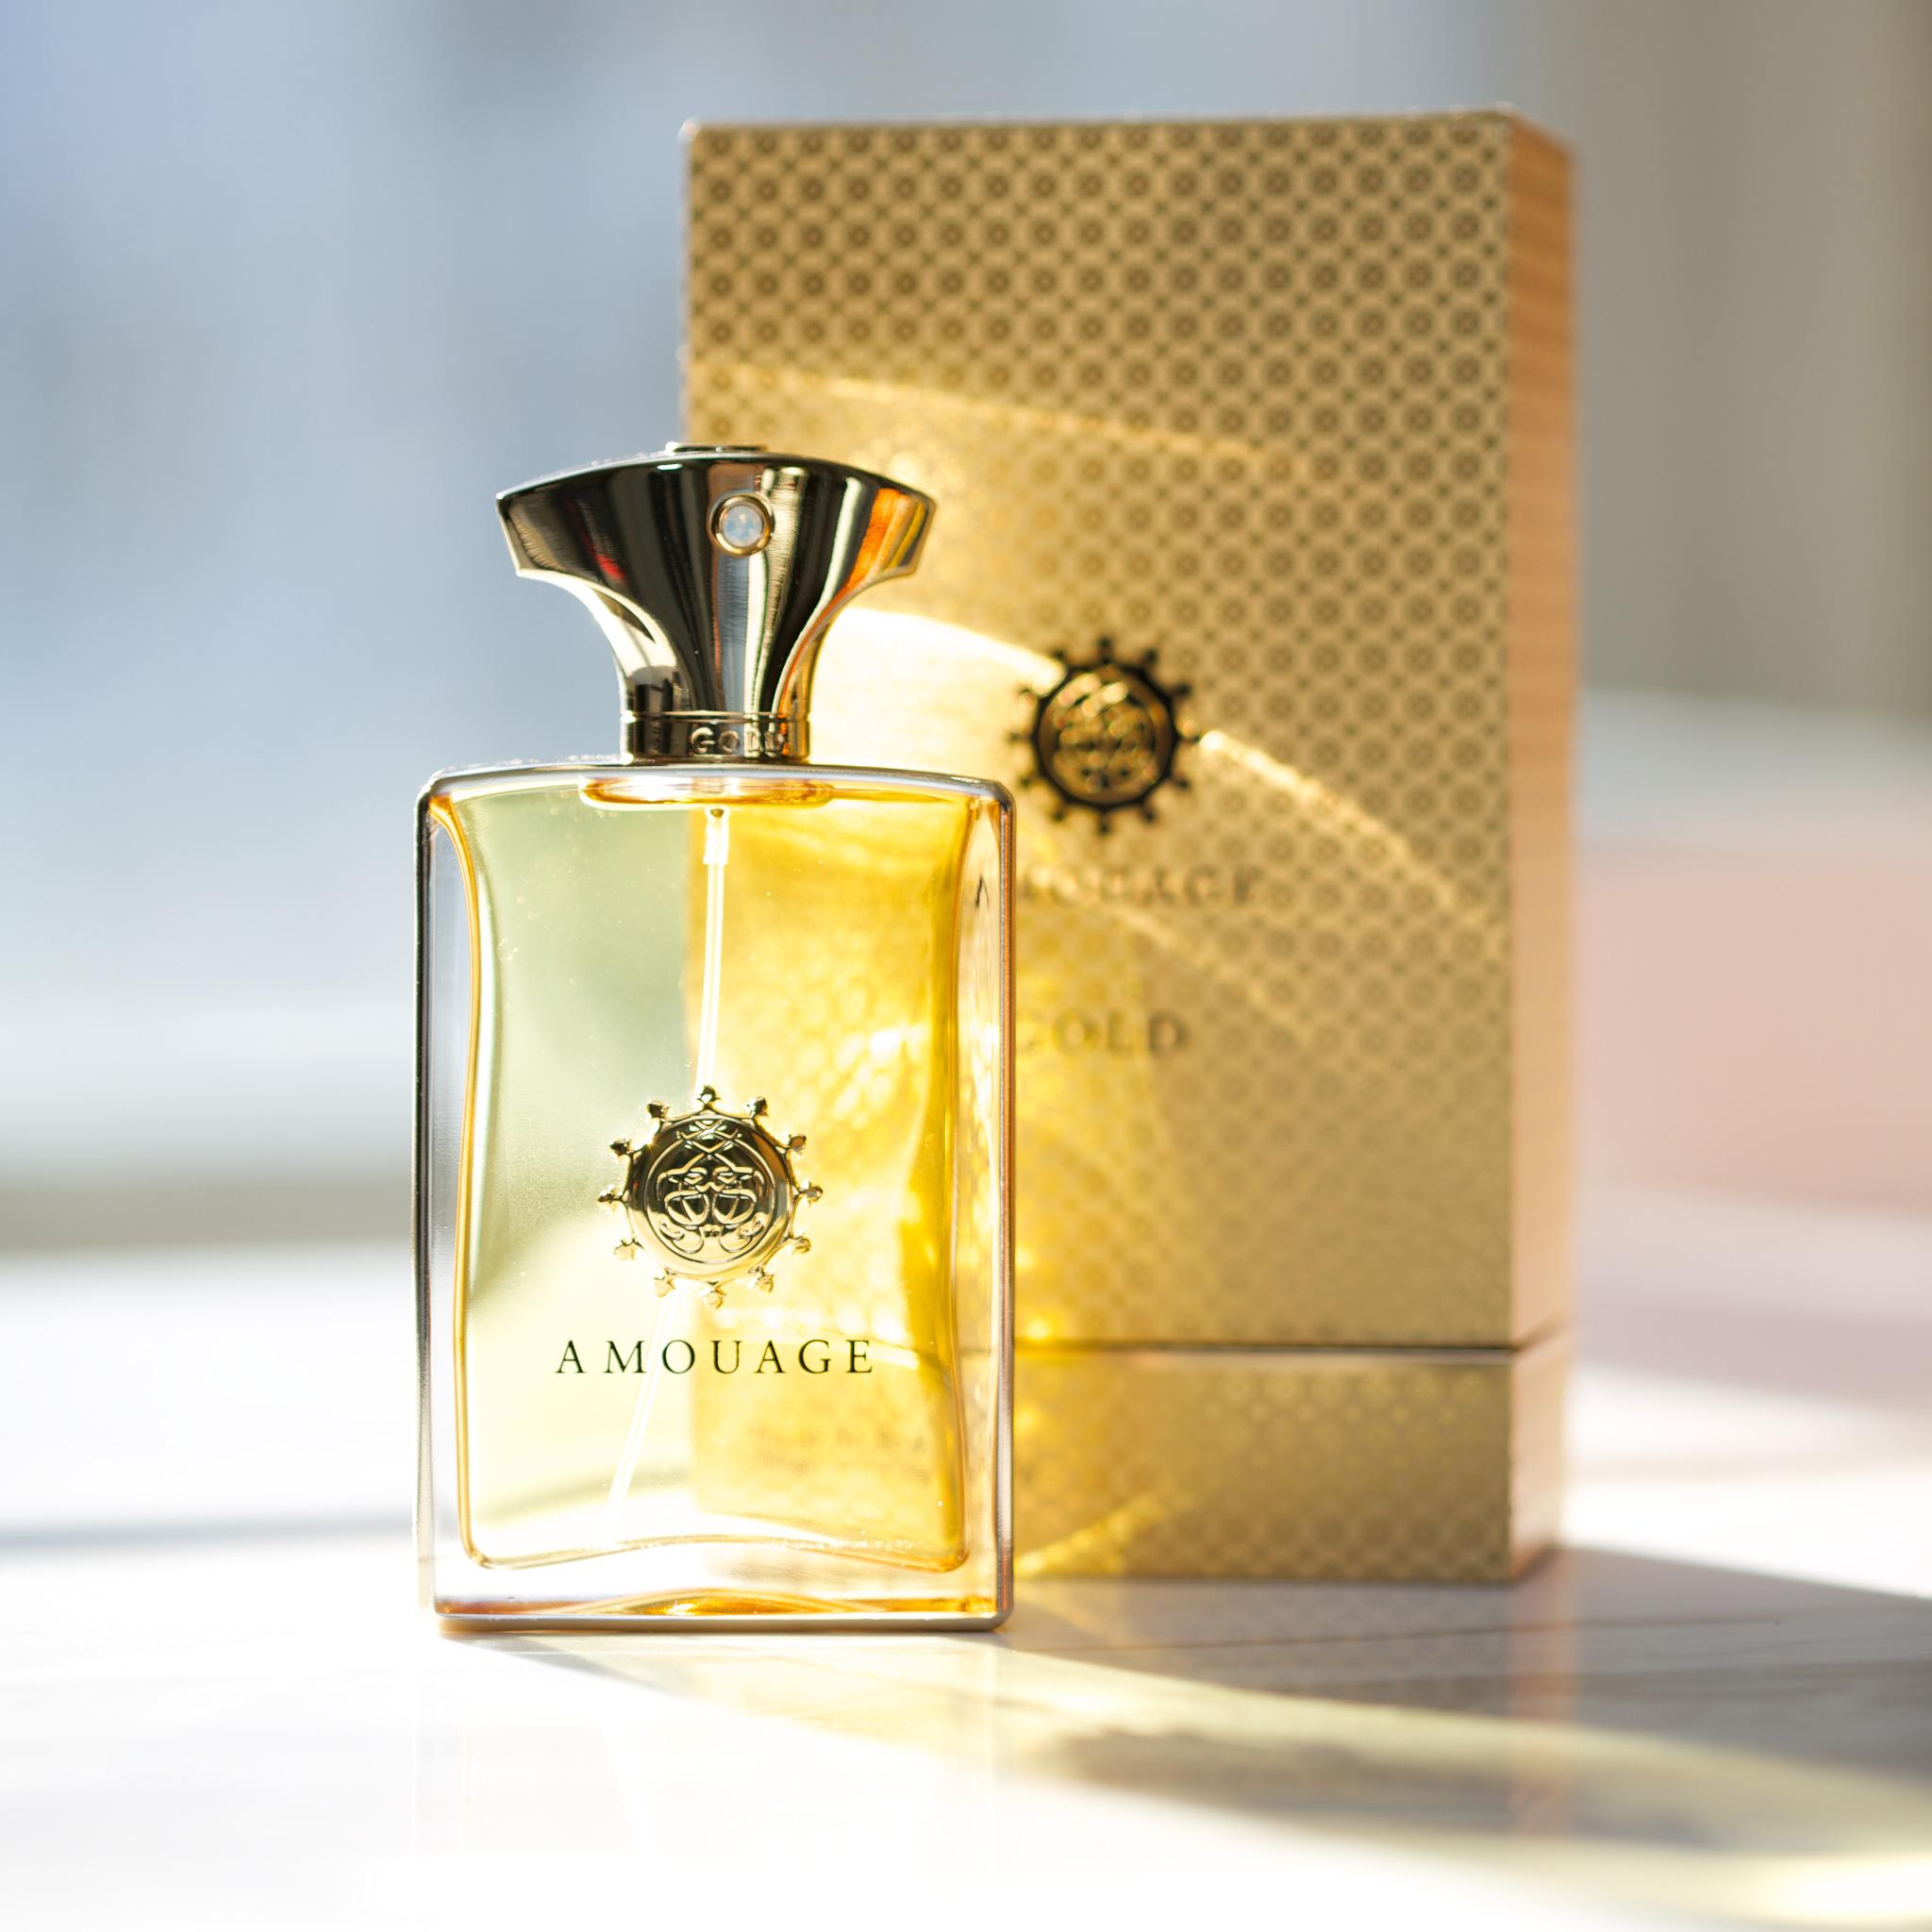 Amouage Gold pour Homme Amouage for men gün ışığı vurmuş kutu şişe.jpg